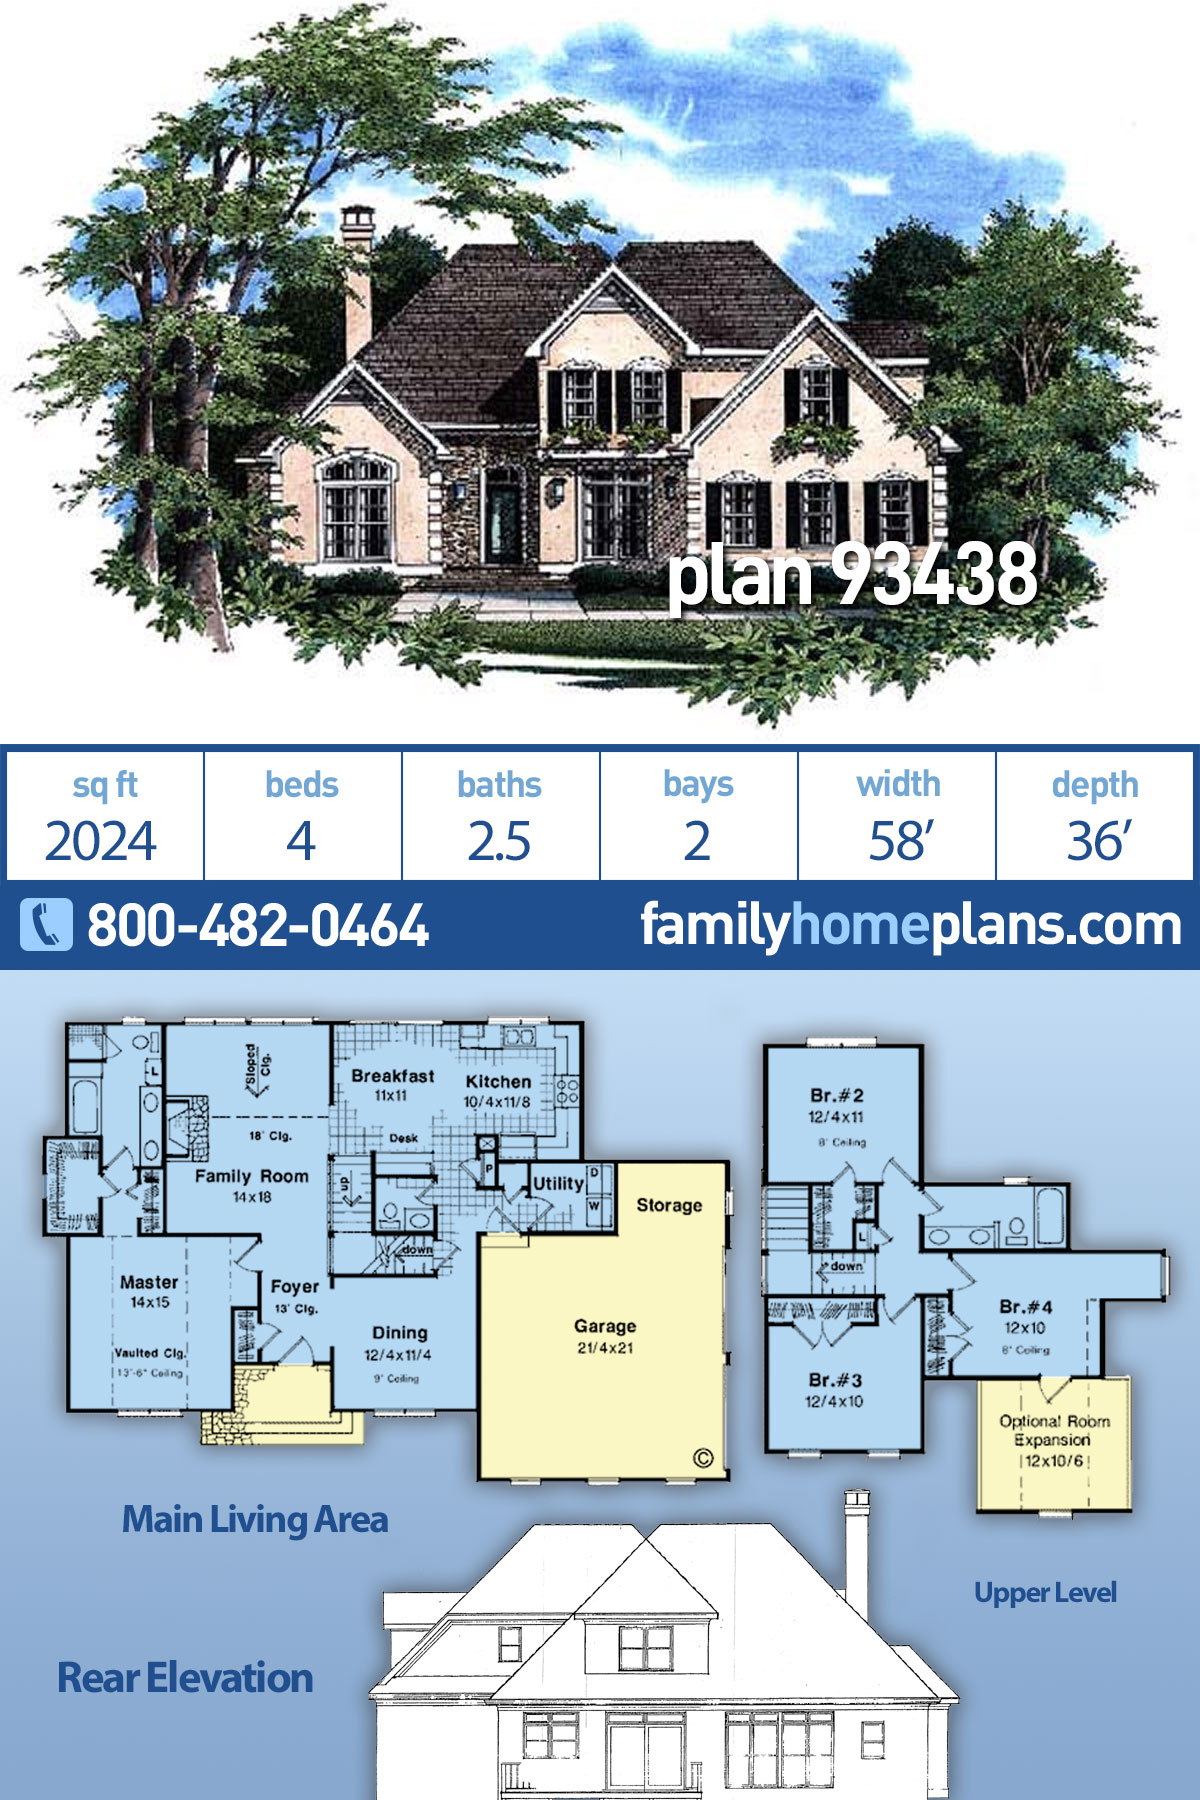 European House Plan 93438 with 4 Beds, 3 Baths, 2 Car Garage